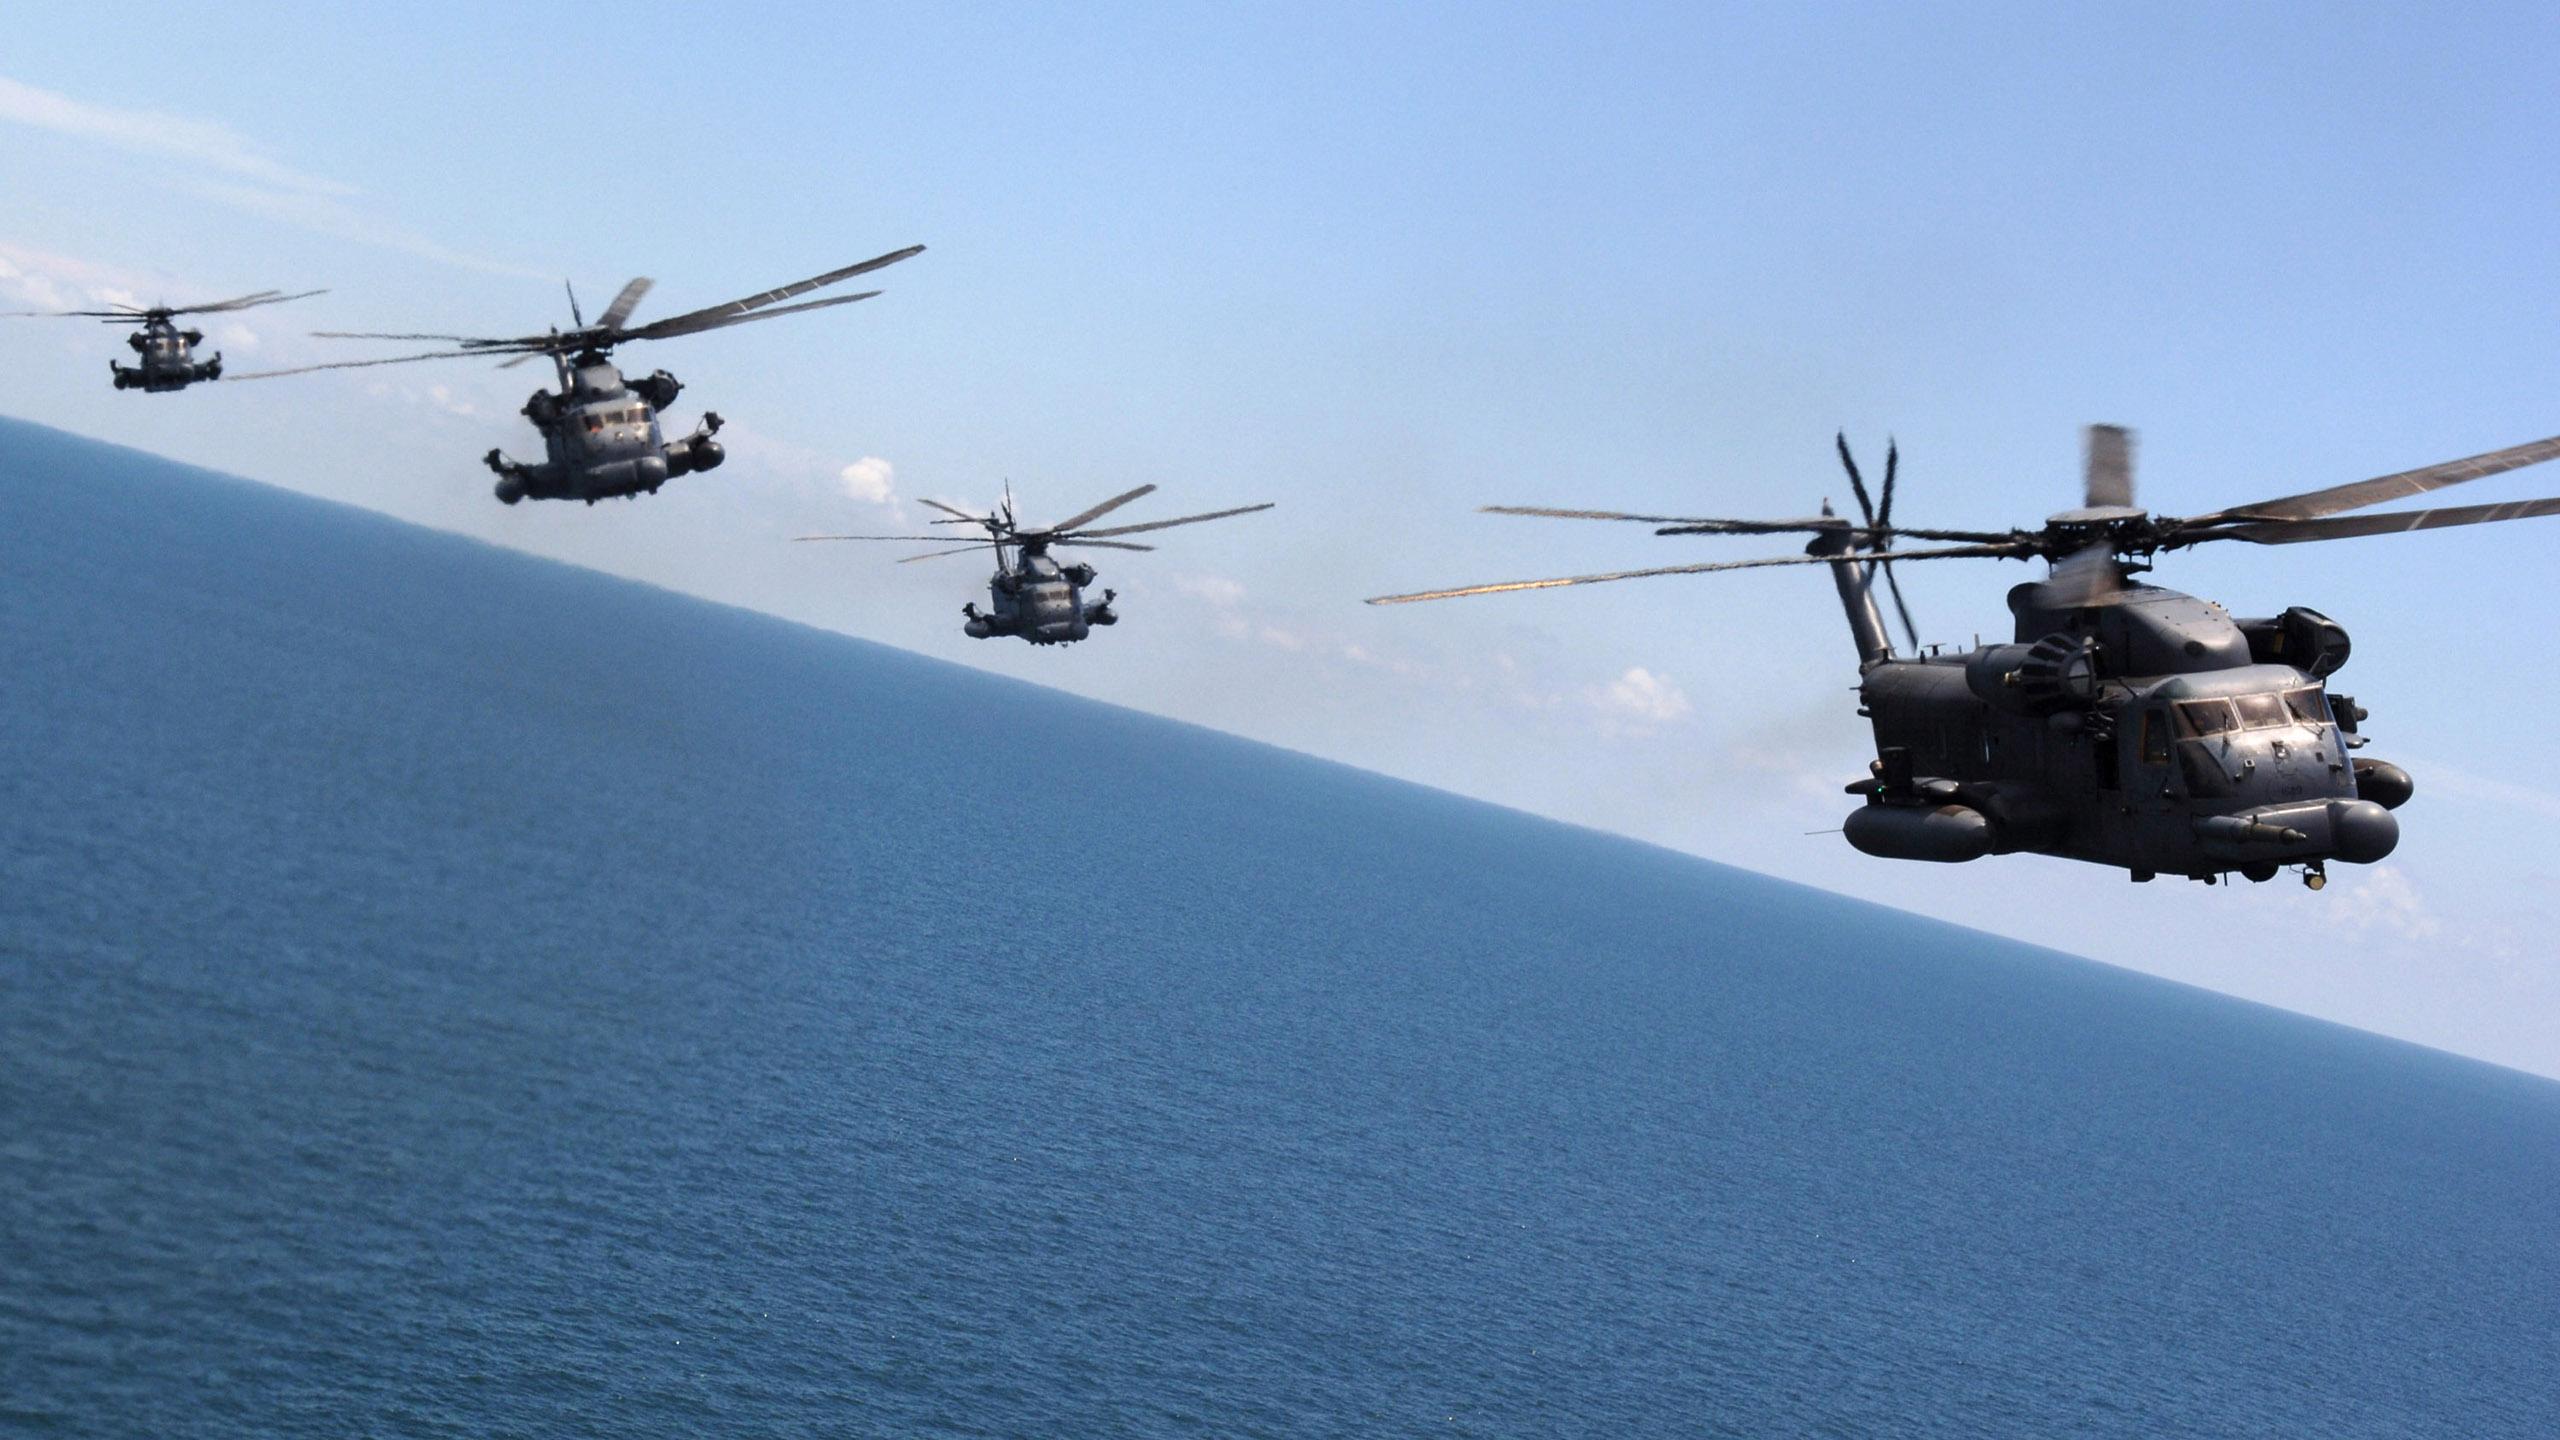 Helicopters Wallpaper 2560x1440 ID32659   WallpaperVortexcom 2560x1440